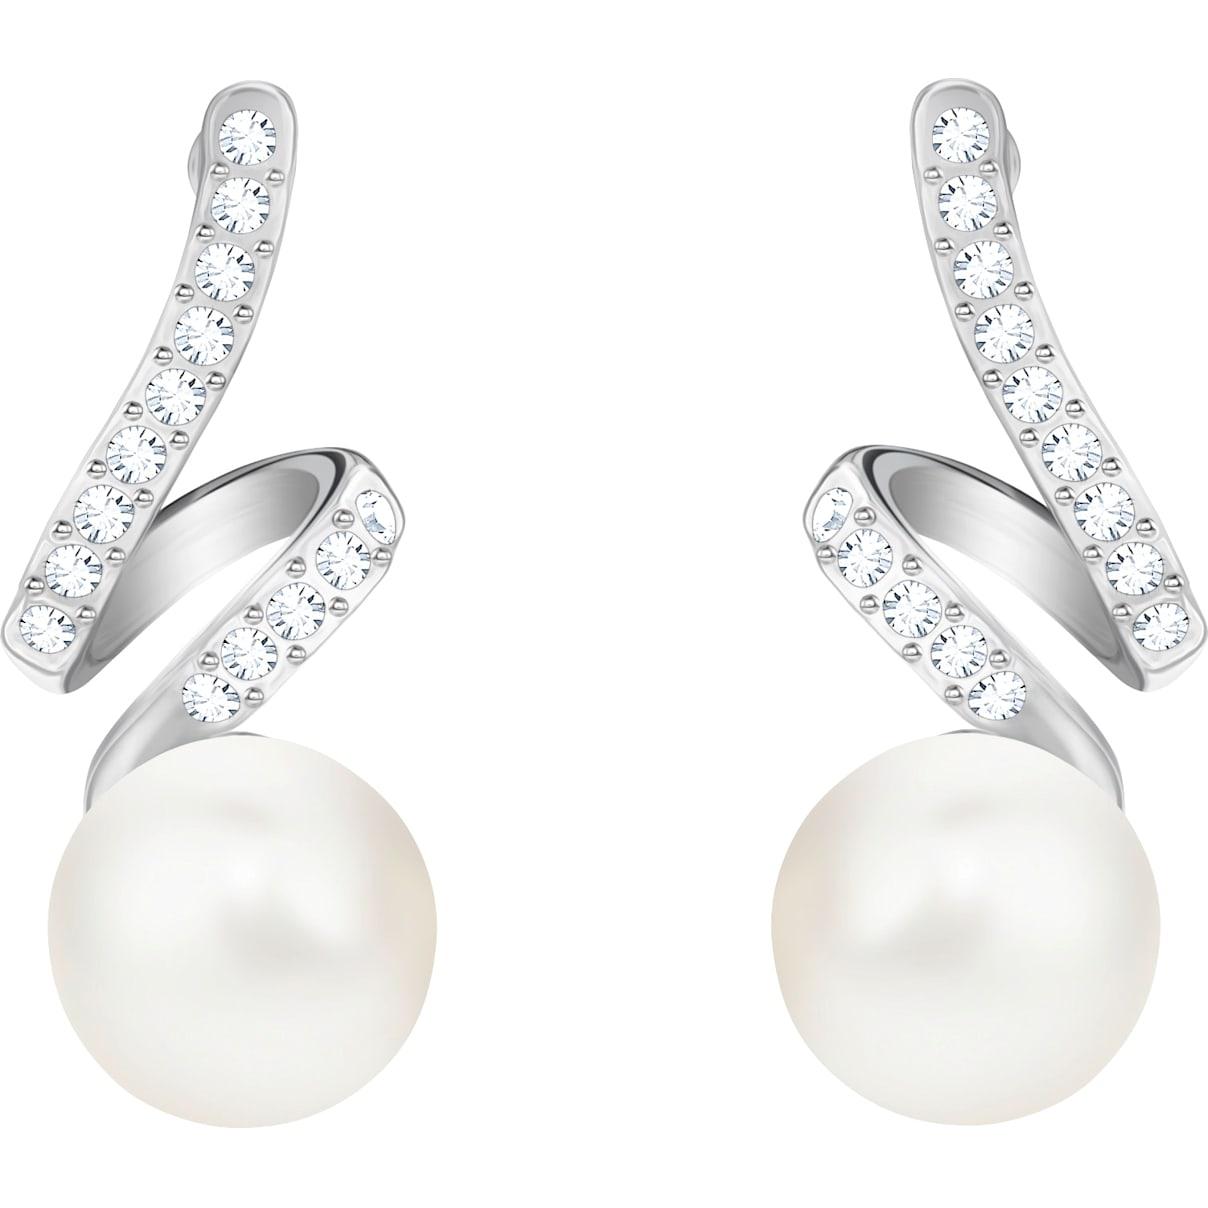 Swarovski Gabriella Pearl Pierced Earrings, White, Rhodium plated